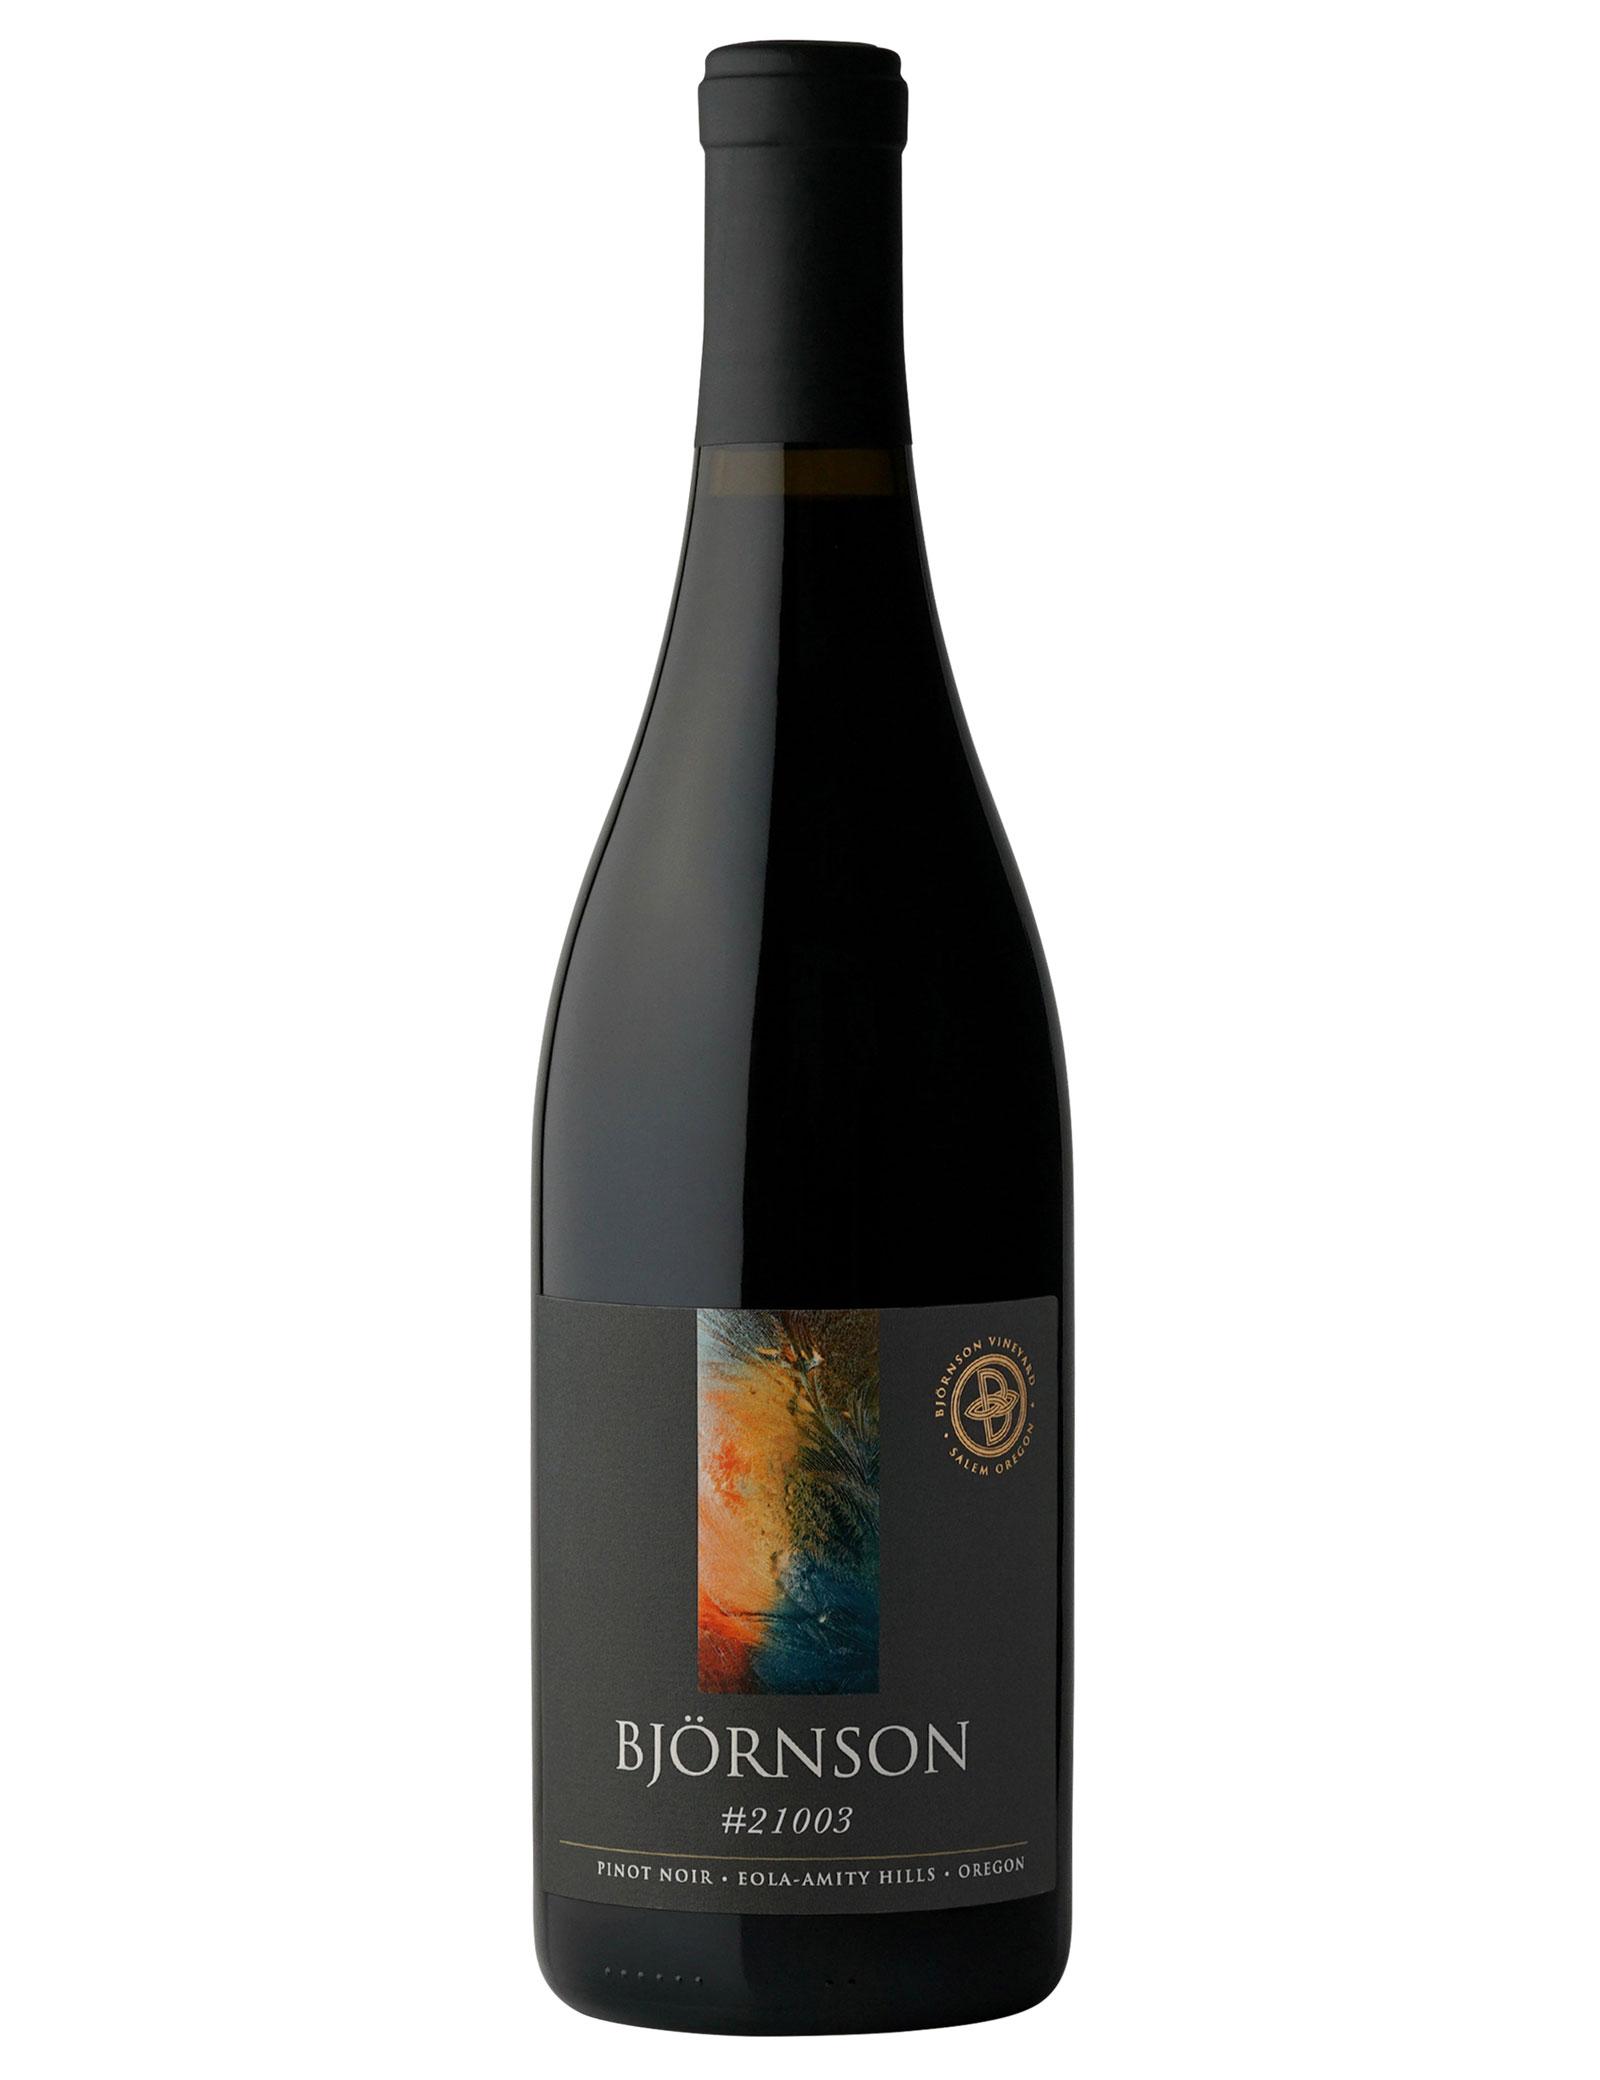 Bjornson #21003 Pinot noir Eola-Amity Hills Oregon